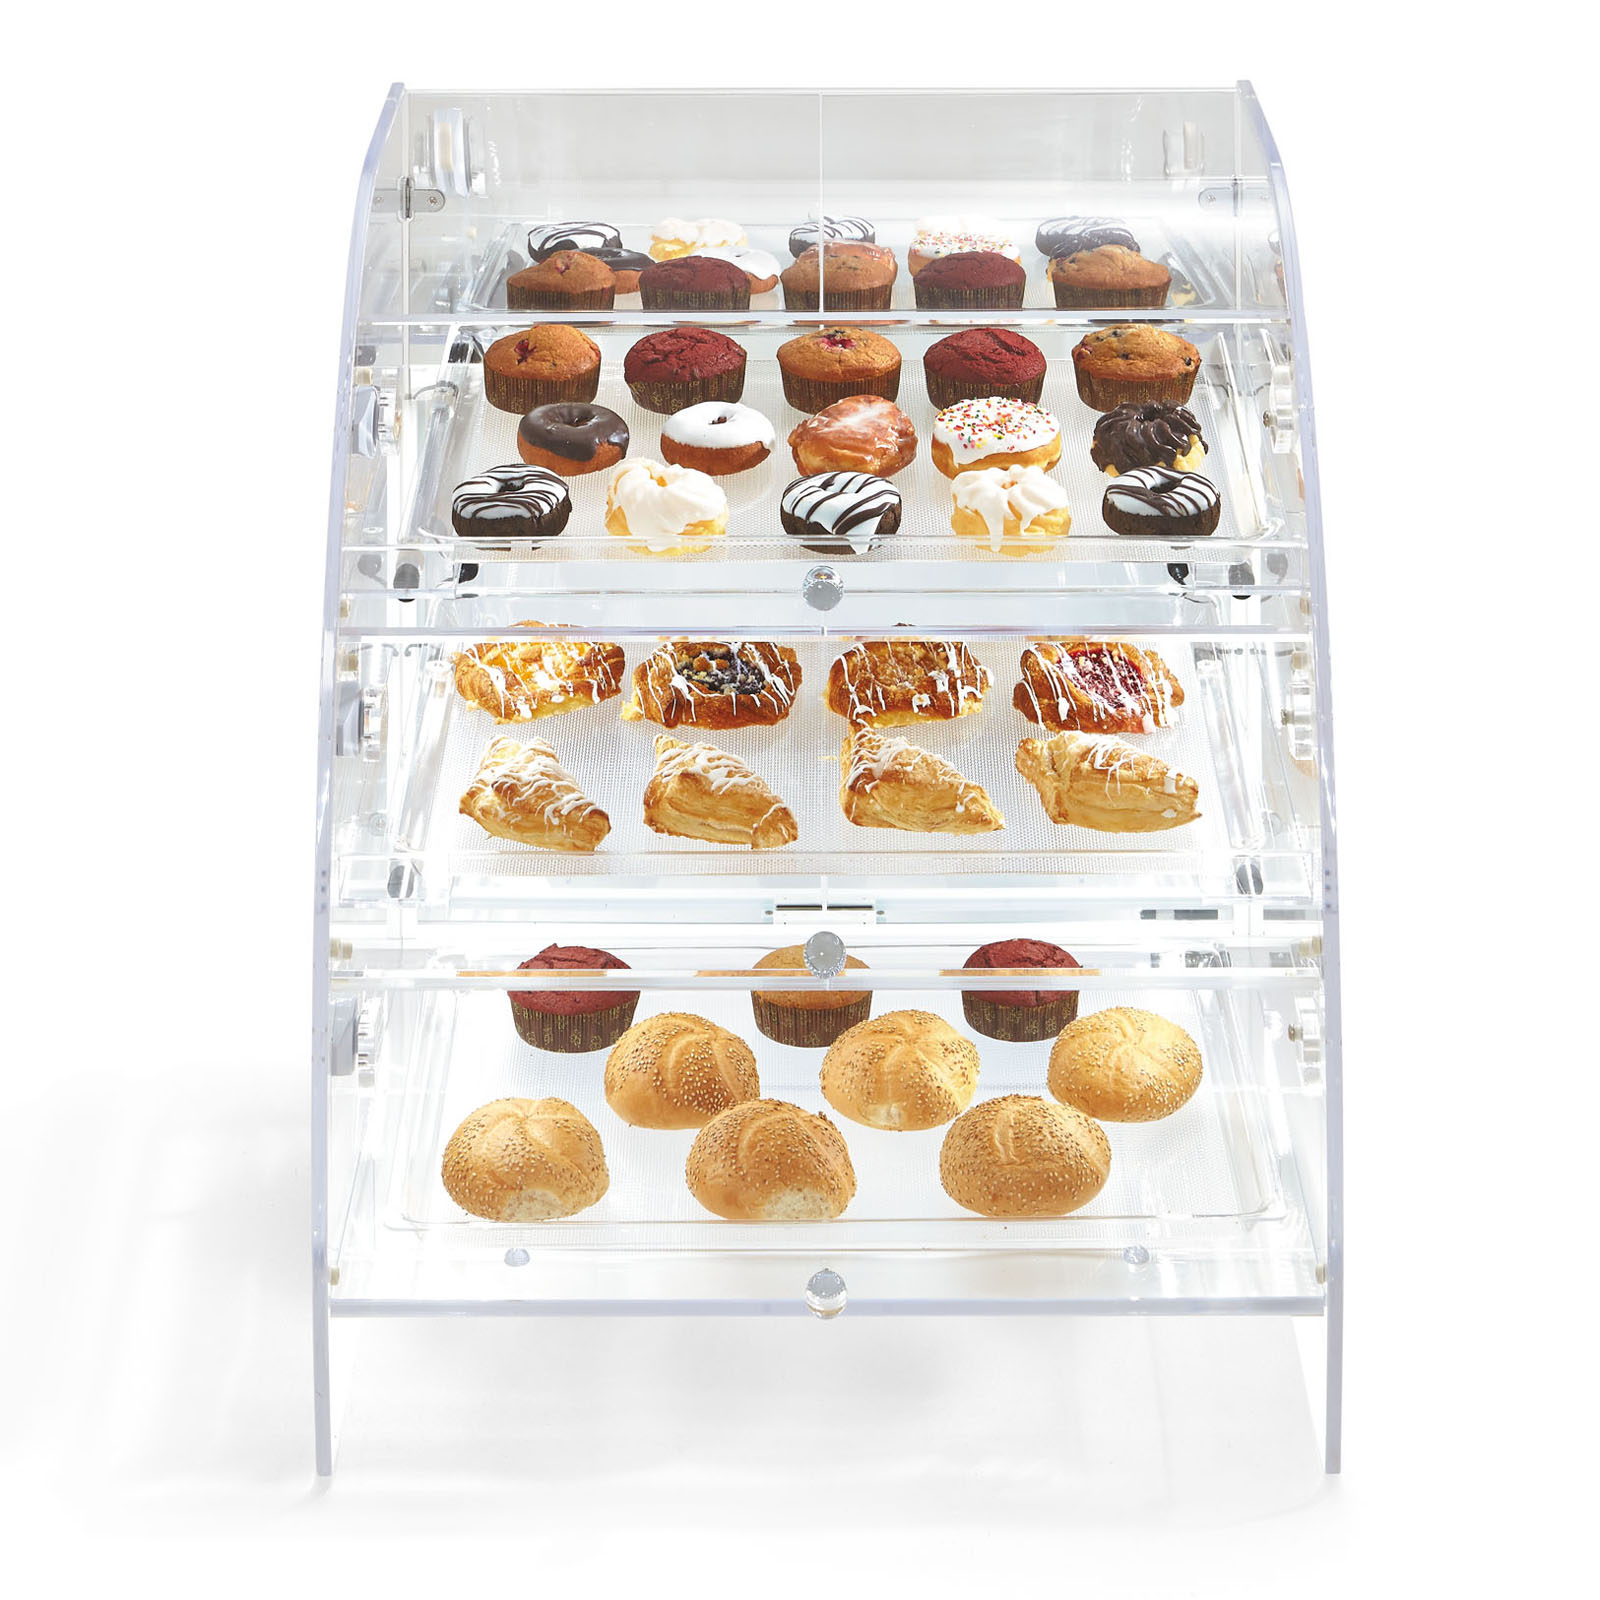 Vollrath XLBC3F-1826-13 display case, pastry, countertop